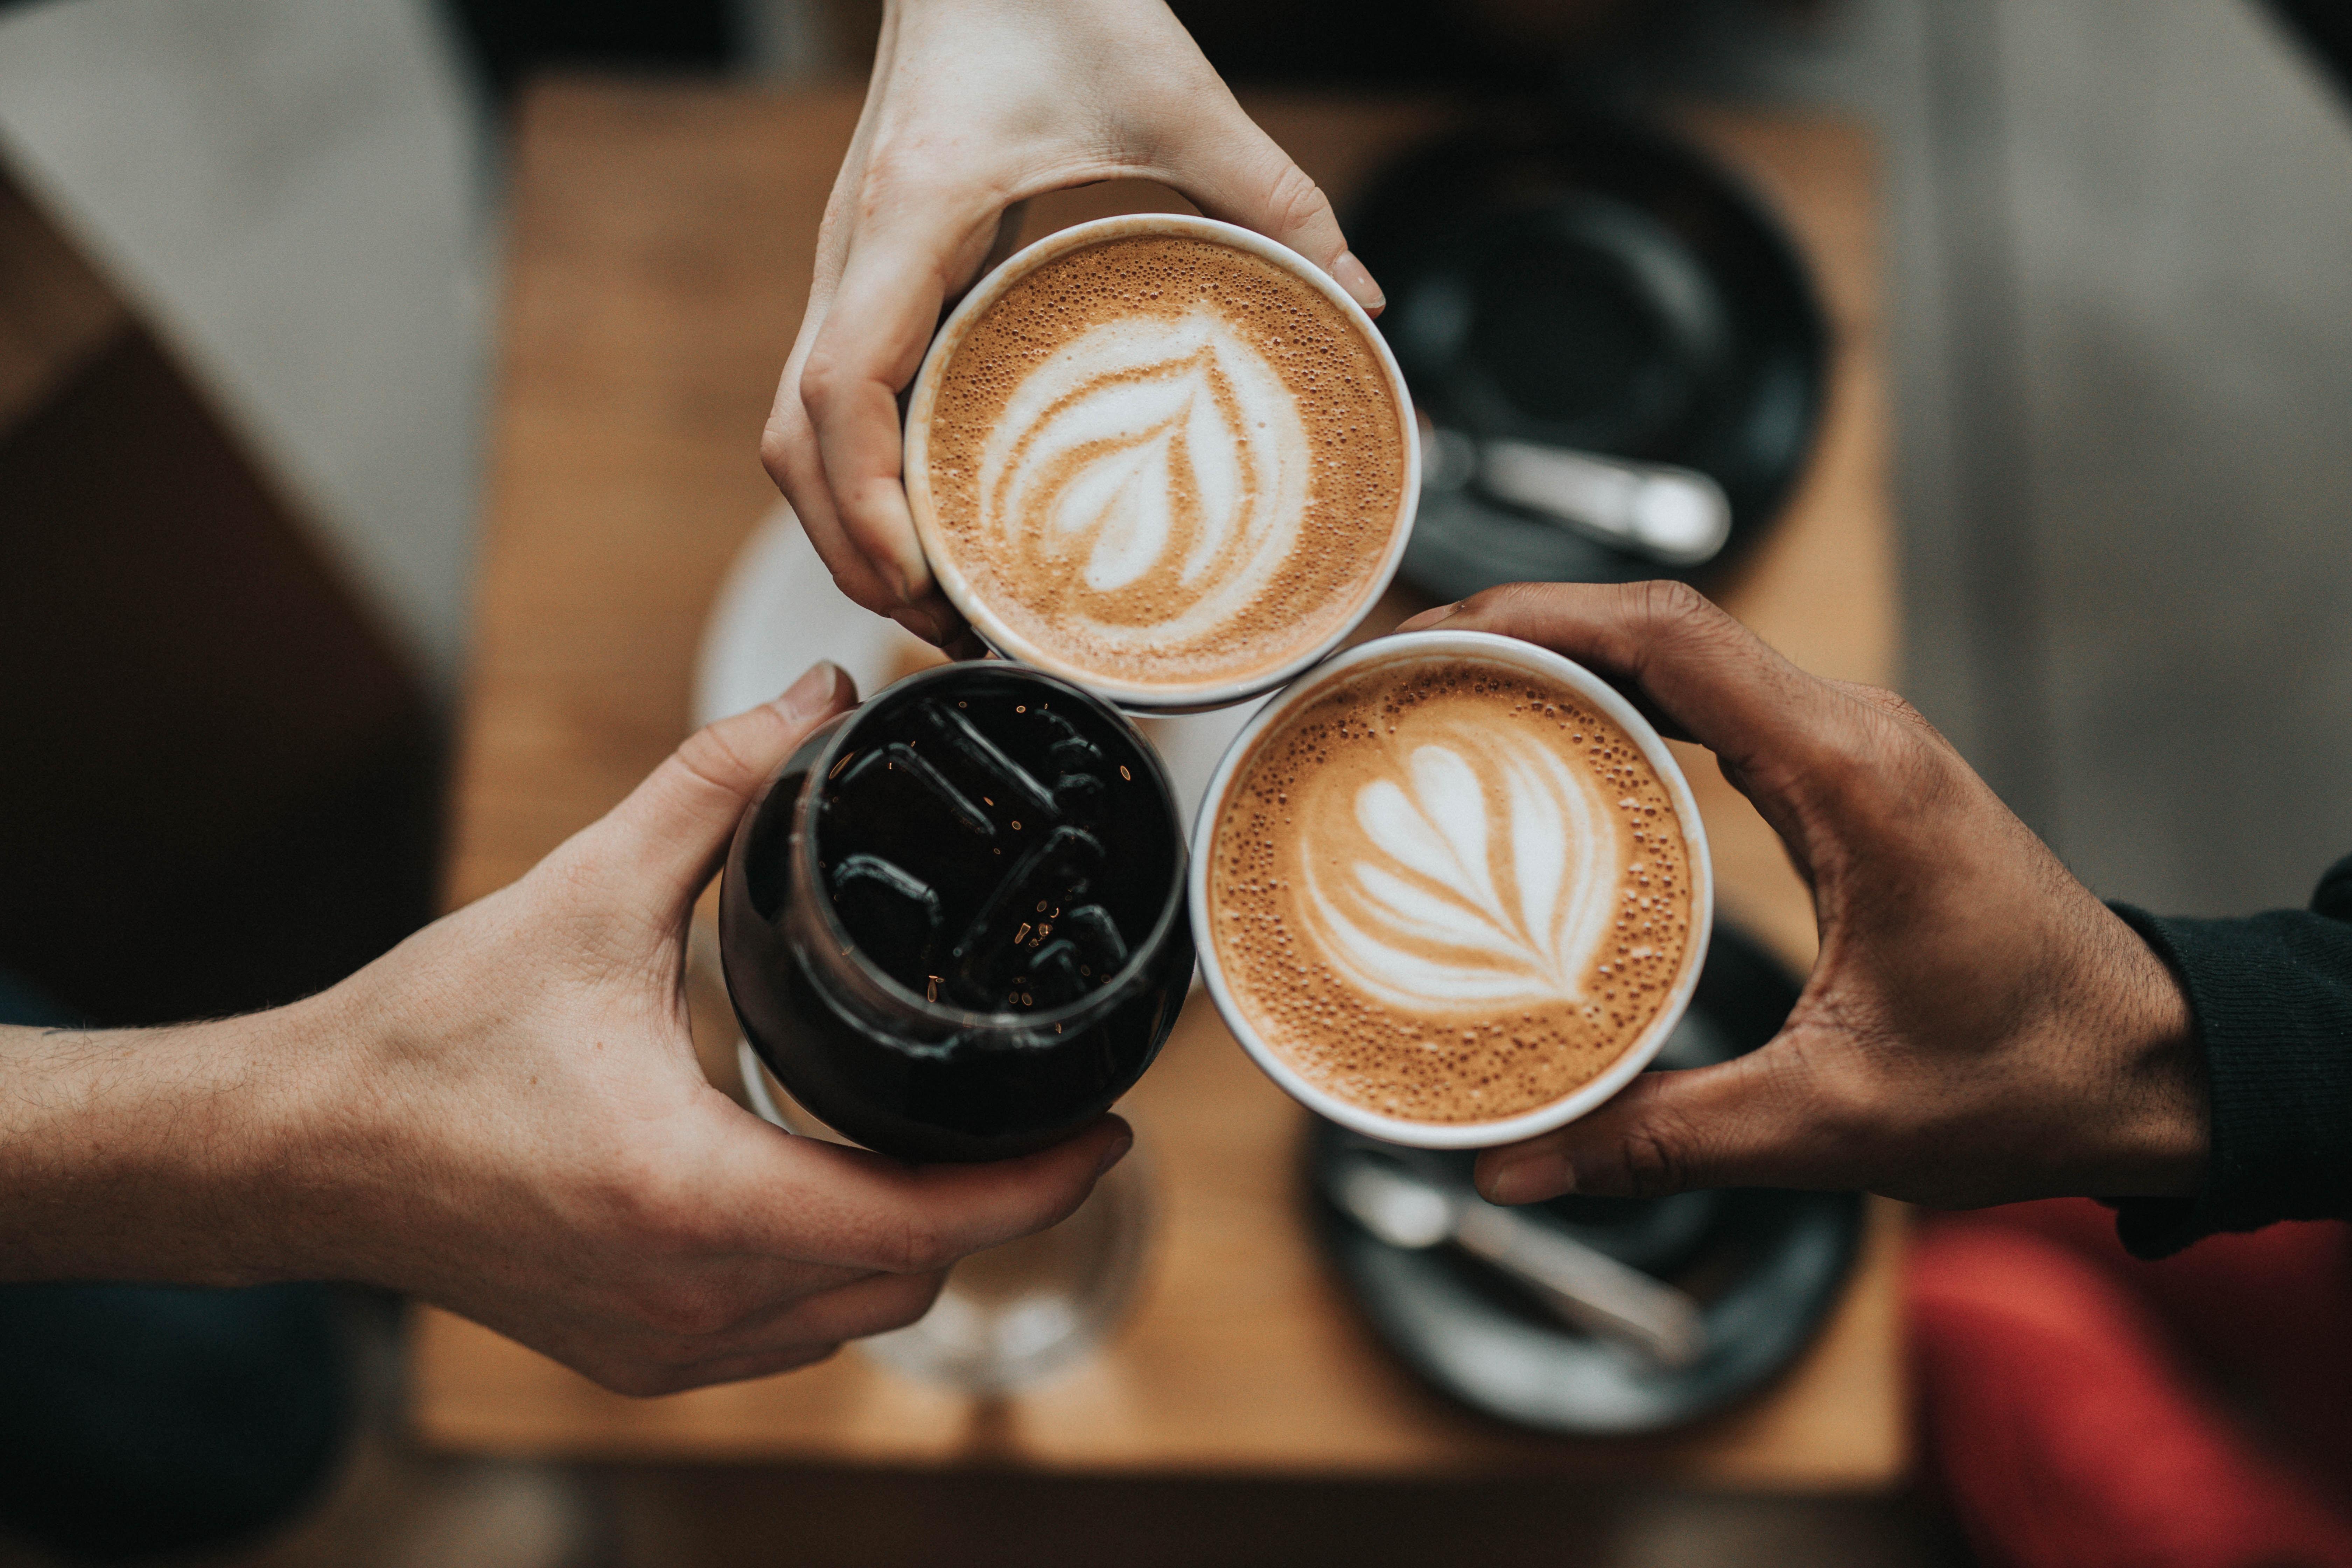 Trinken nackt kaffee Stream Nackt